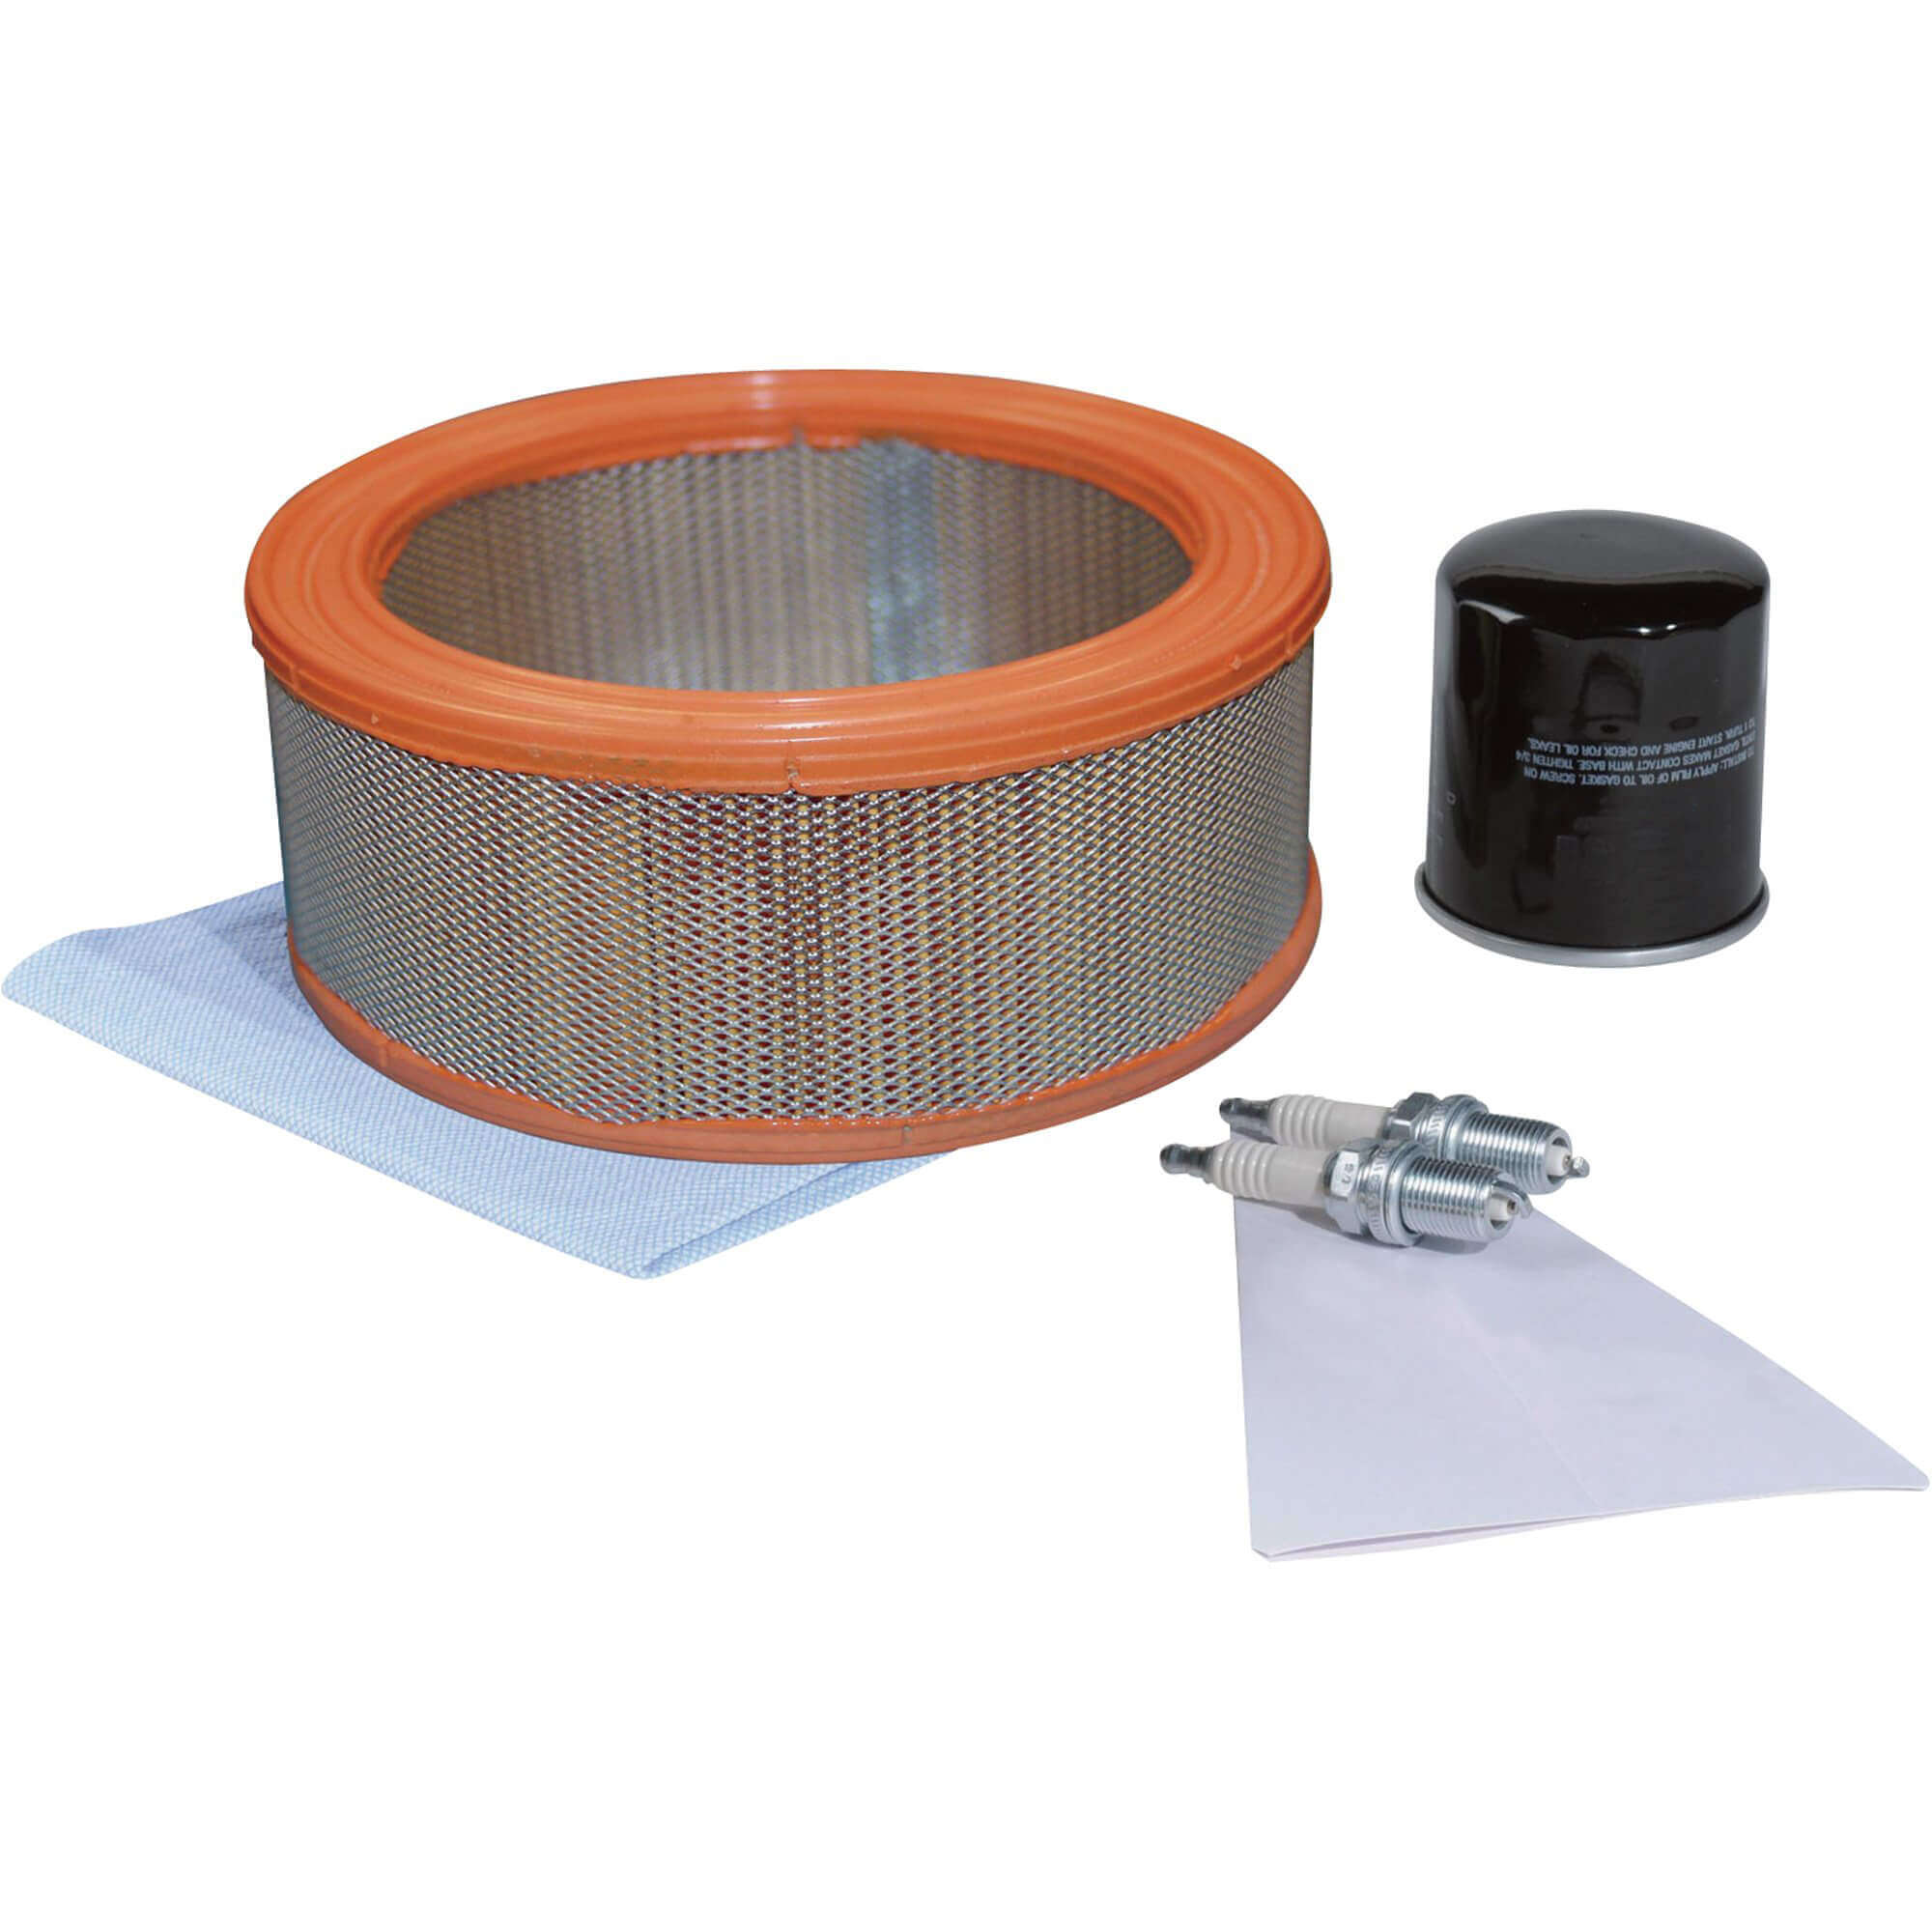 pressure washer maintenance - Pressure Washer Service & Repair